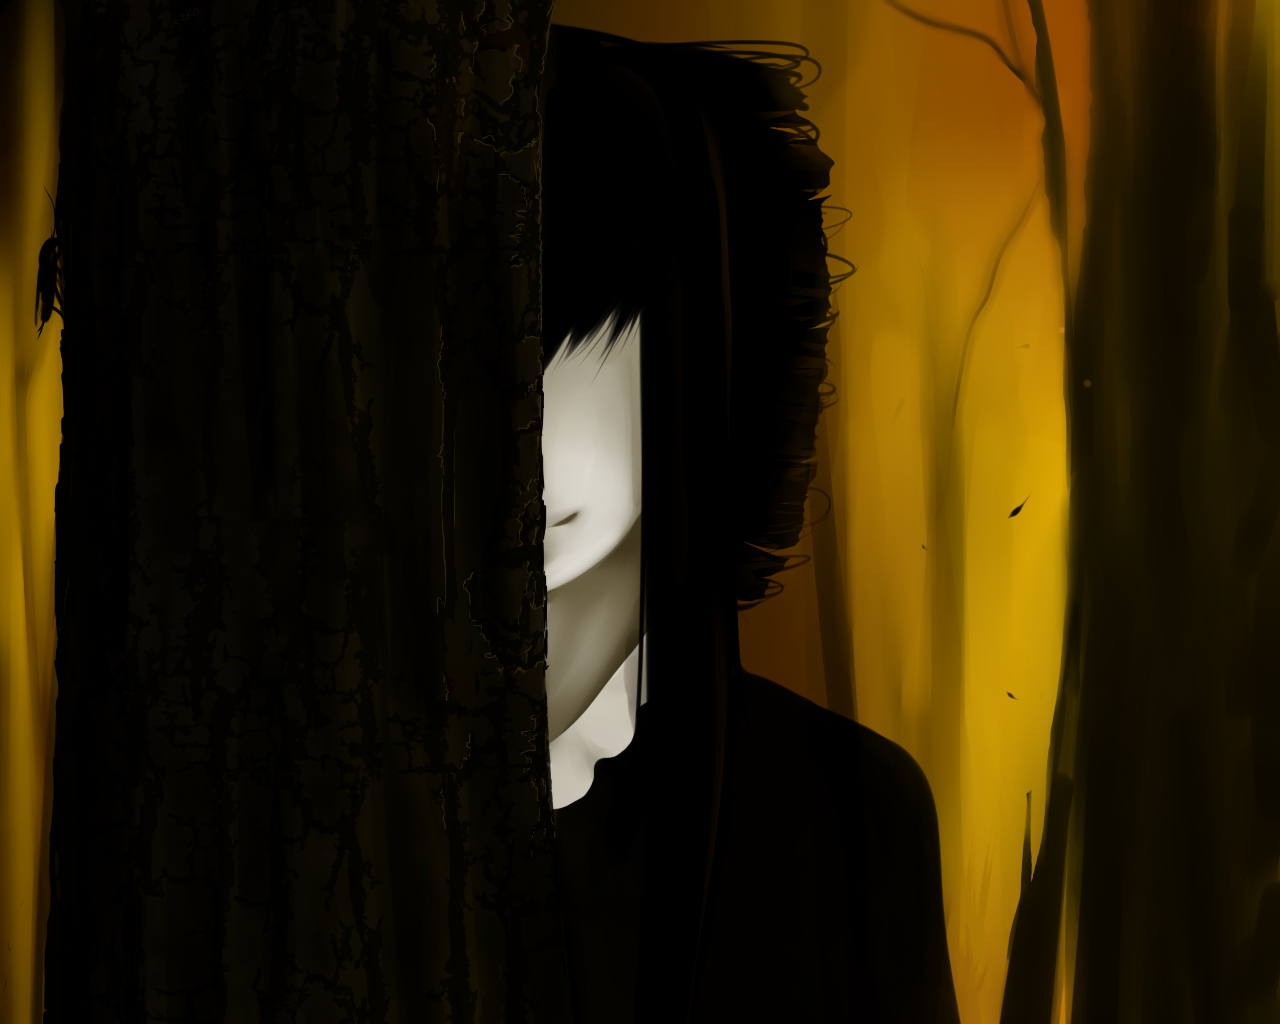 Who stalks the stalker?